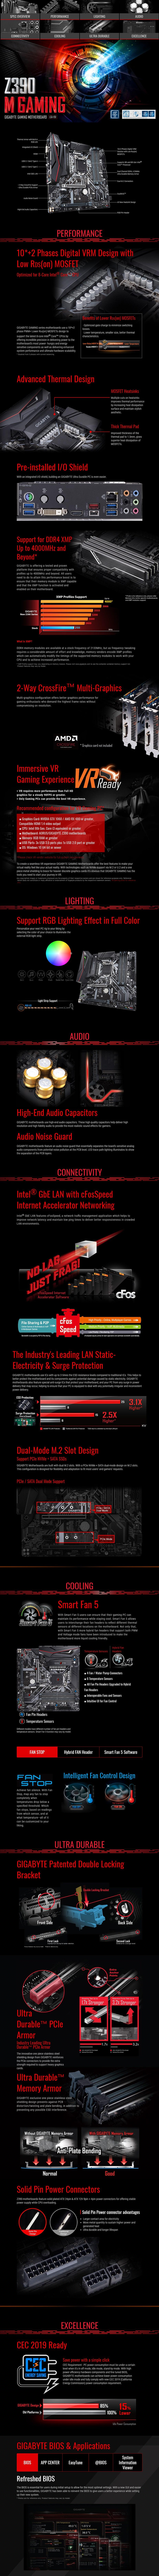 Gigabyte Z390 M GAMING LGA 1511 mATX Motherboard - Desktop Overview 1